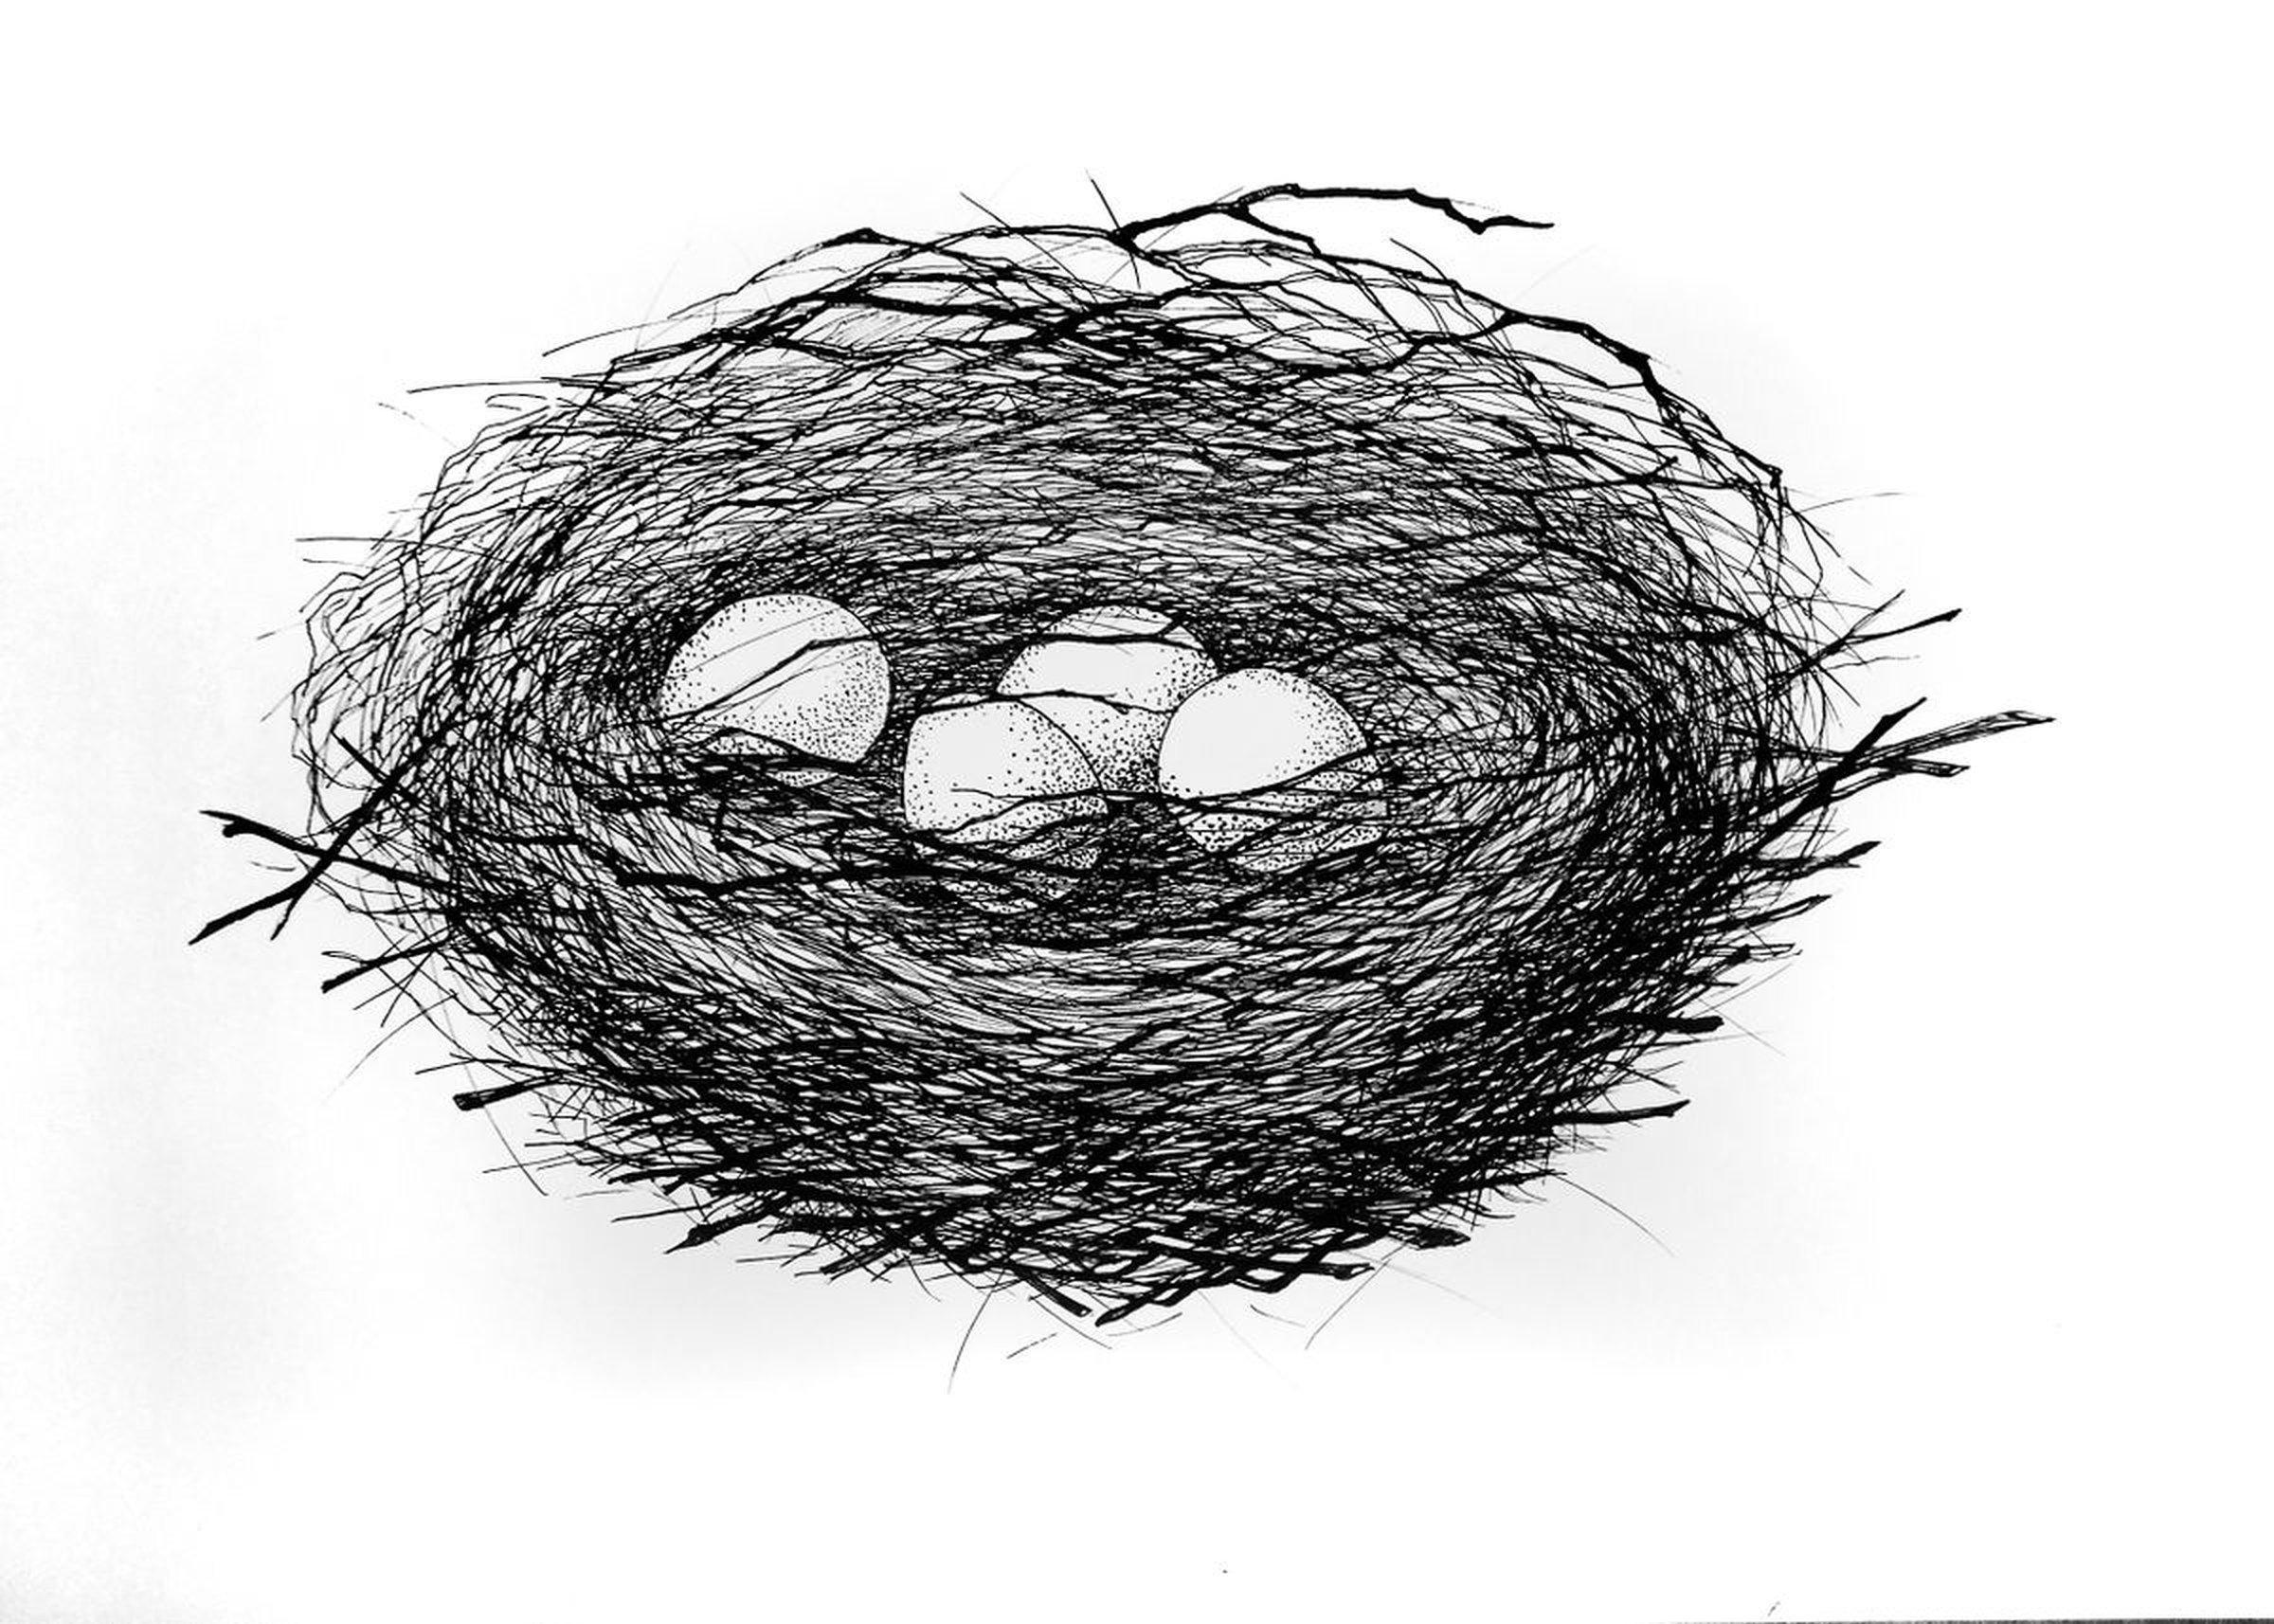 Line Drawing Nest : Nest ink drawing by alice nesterenko artfinder